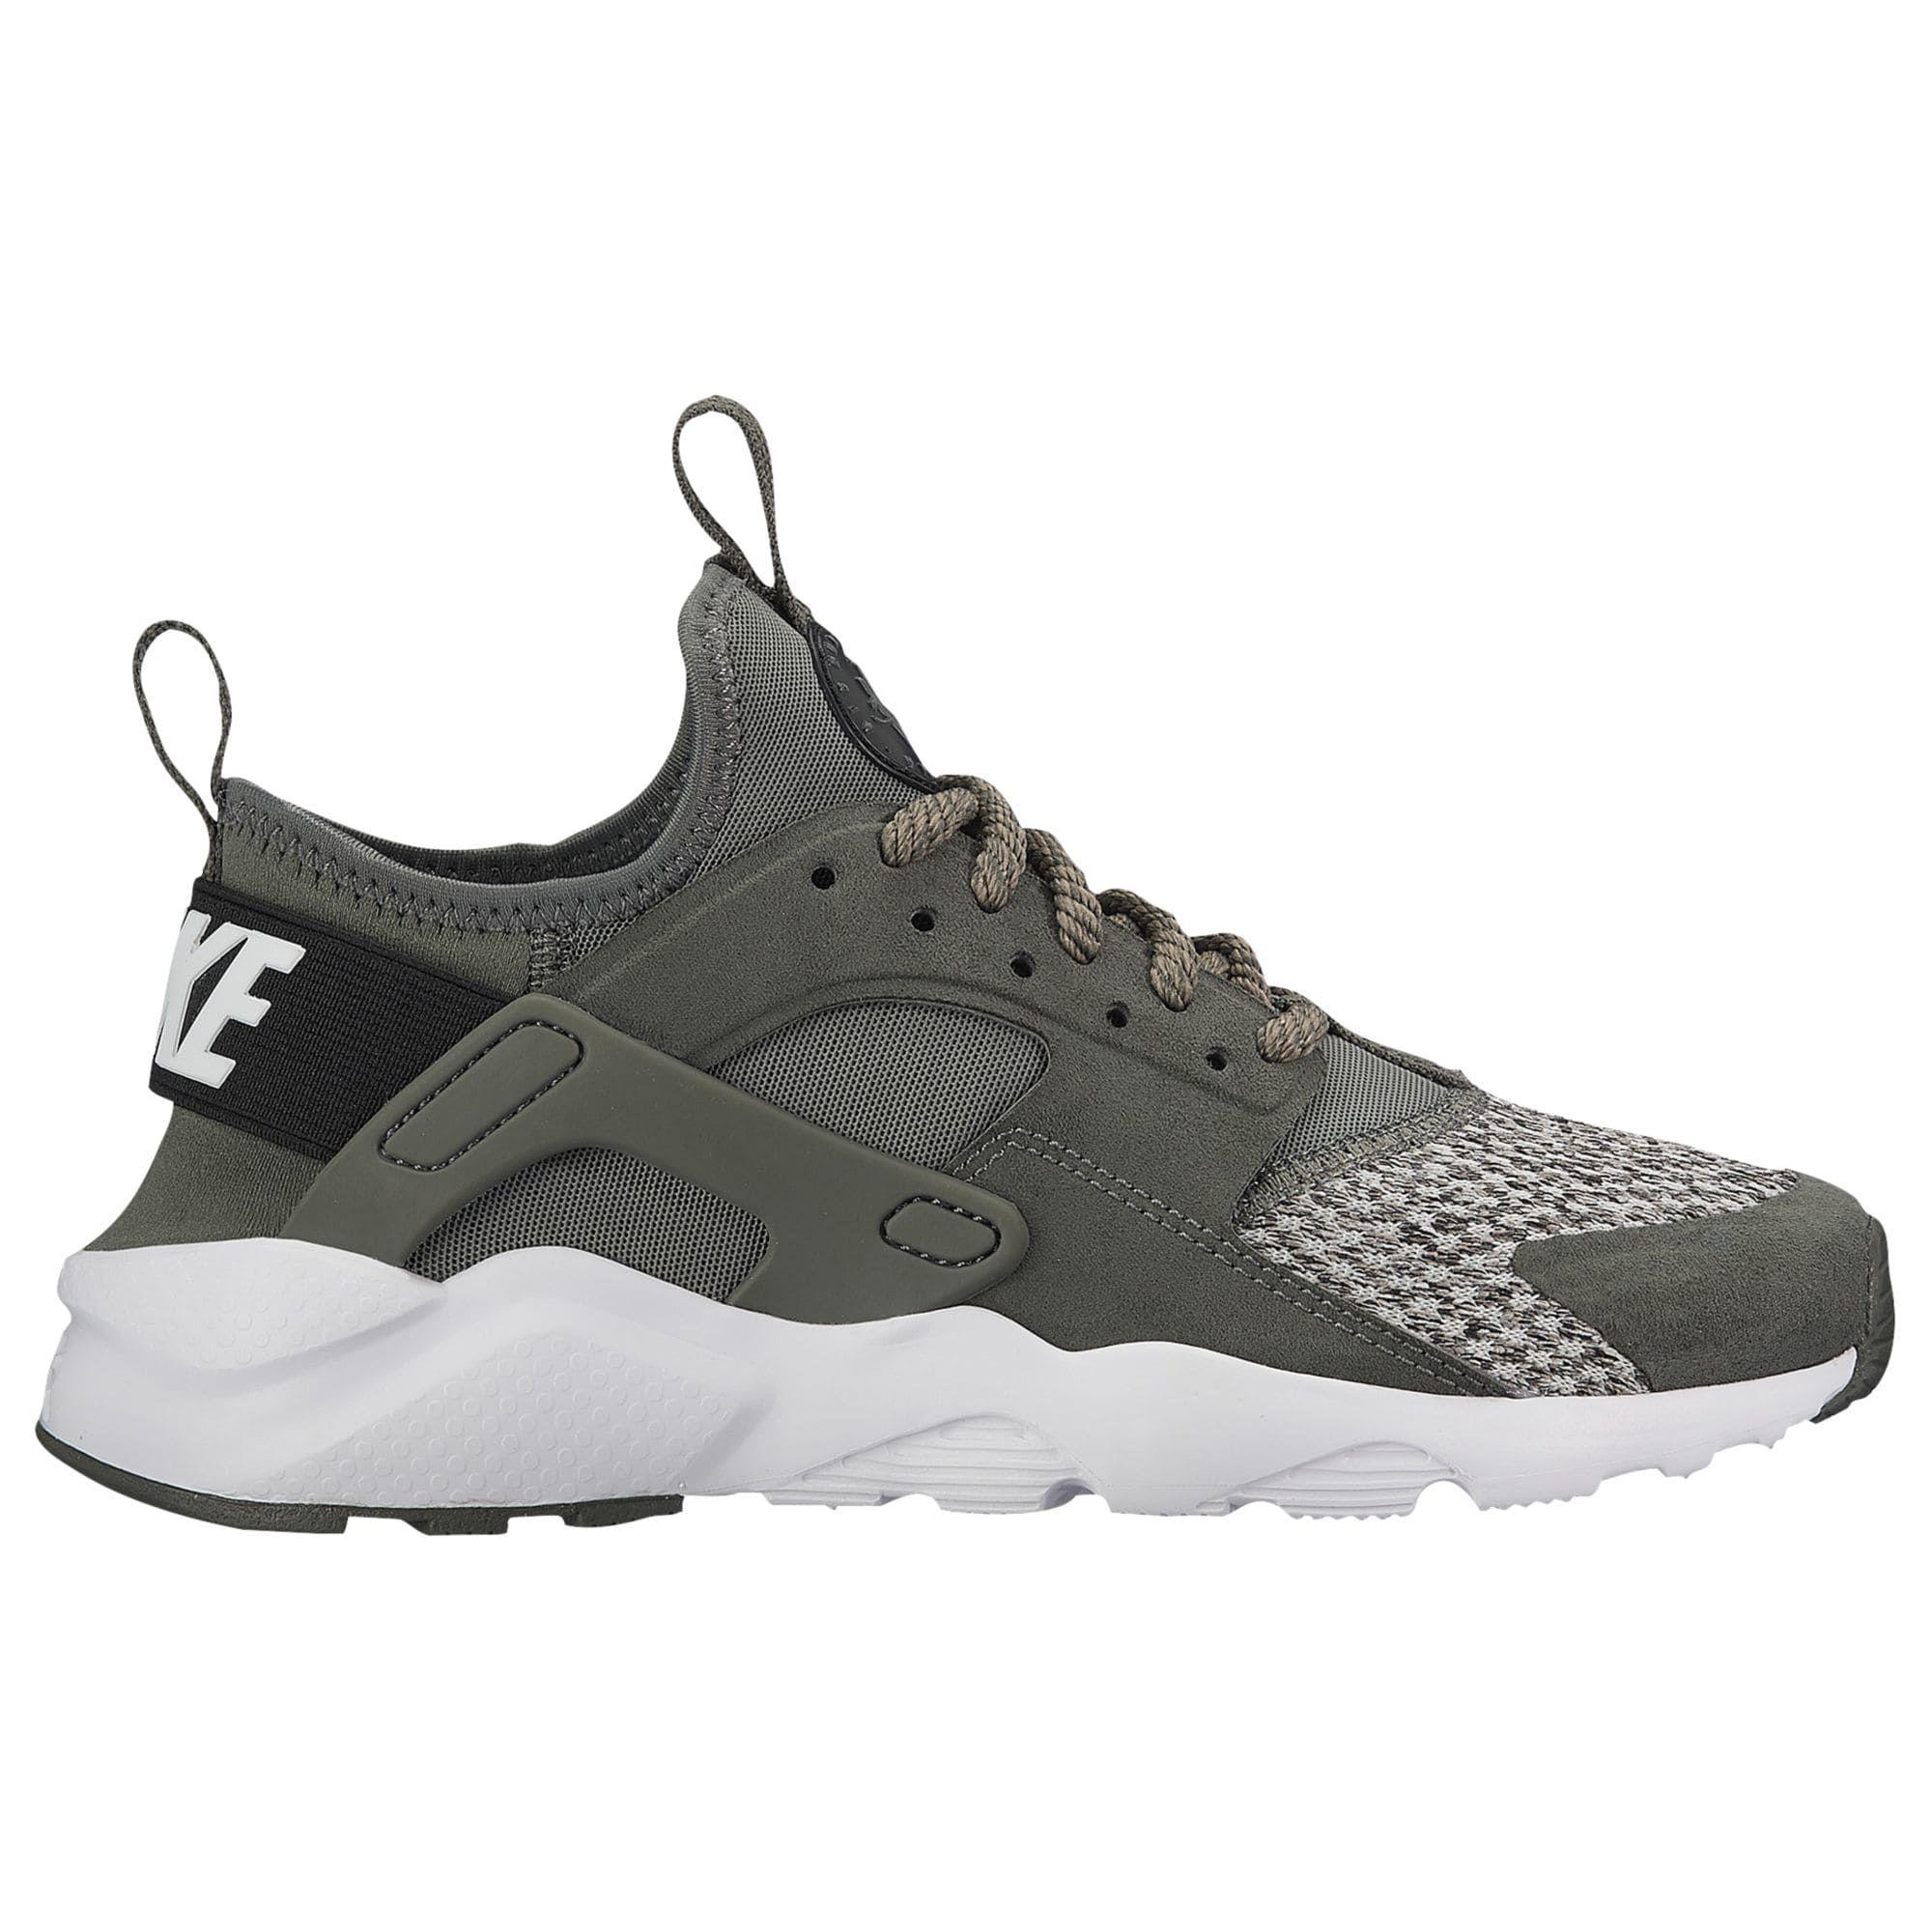 c399ab7f49 Nike Huarache Run Ultra - River Rock | Shoes for daze | Nike ...